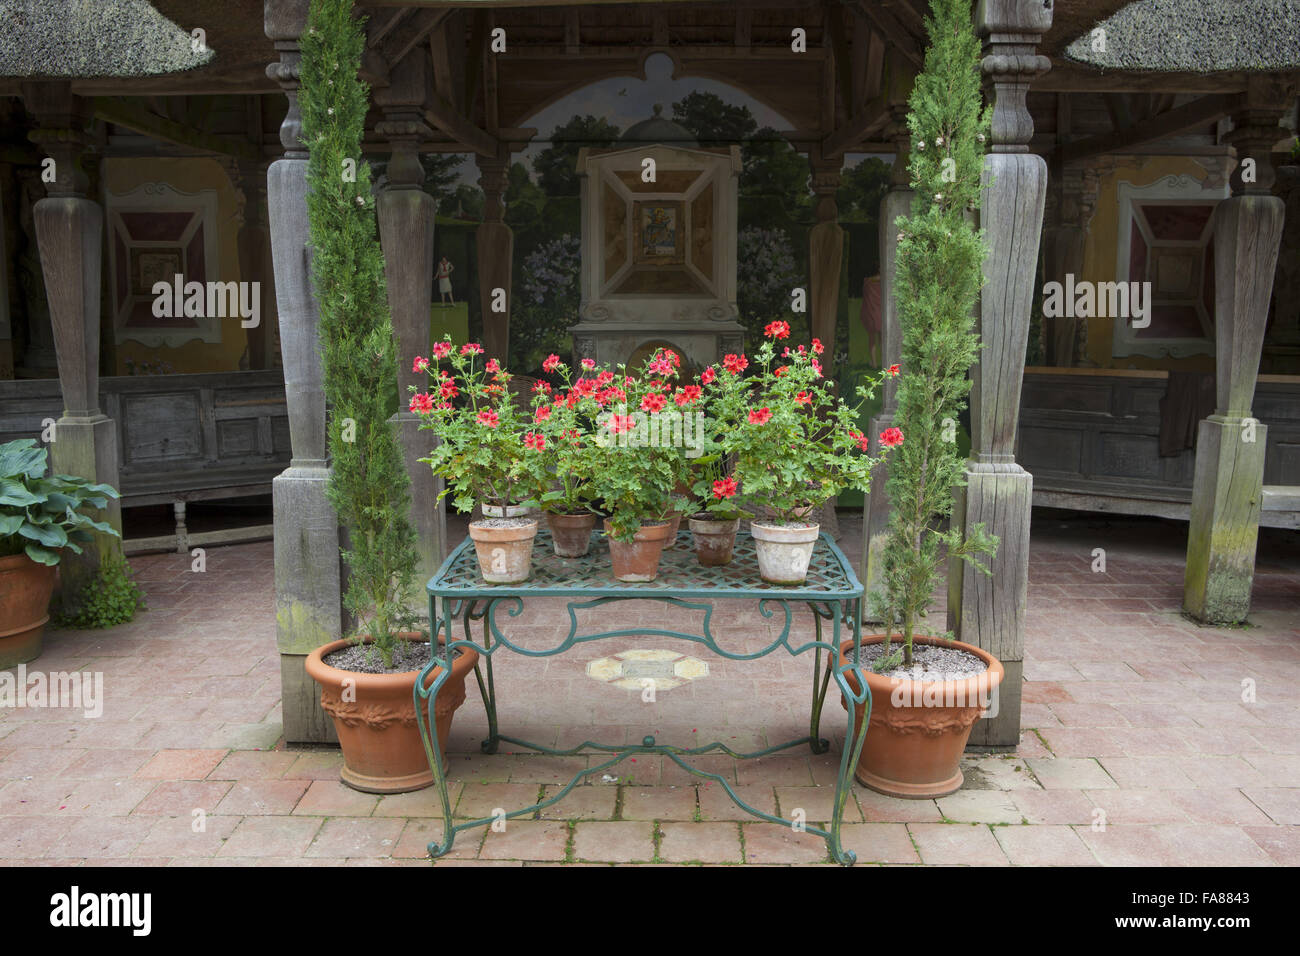 Display of Pelargonium 'Scarlet Unique' in terracotta pots in The Italian Garden at Hidcote, Gloucestershire, - Stock Image